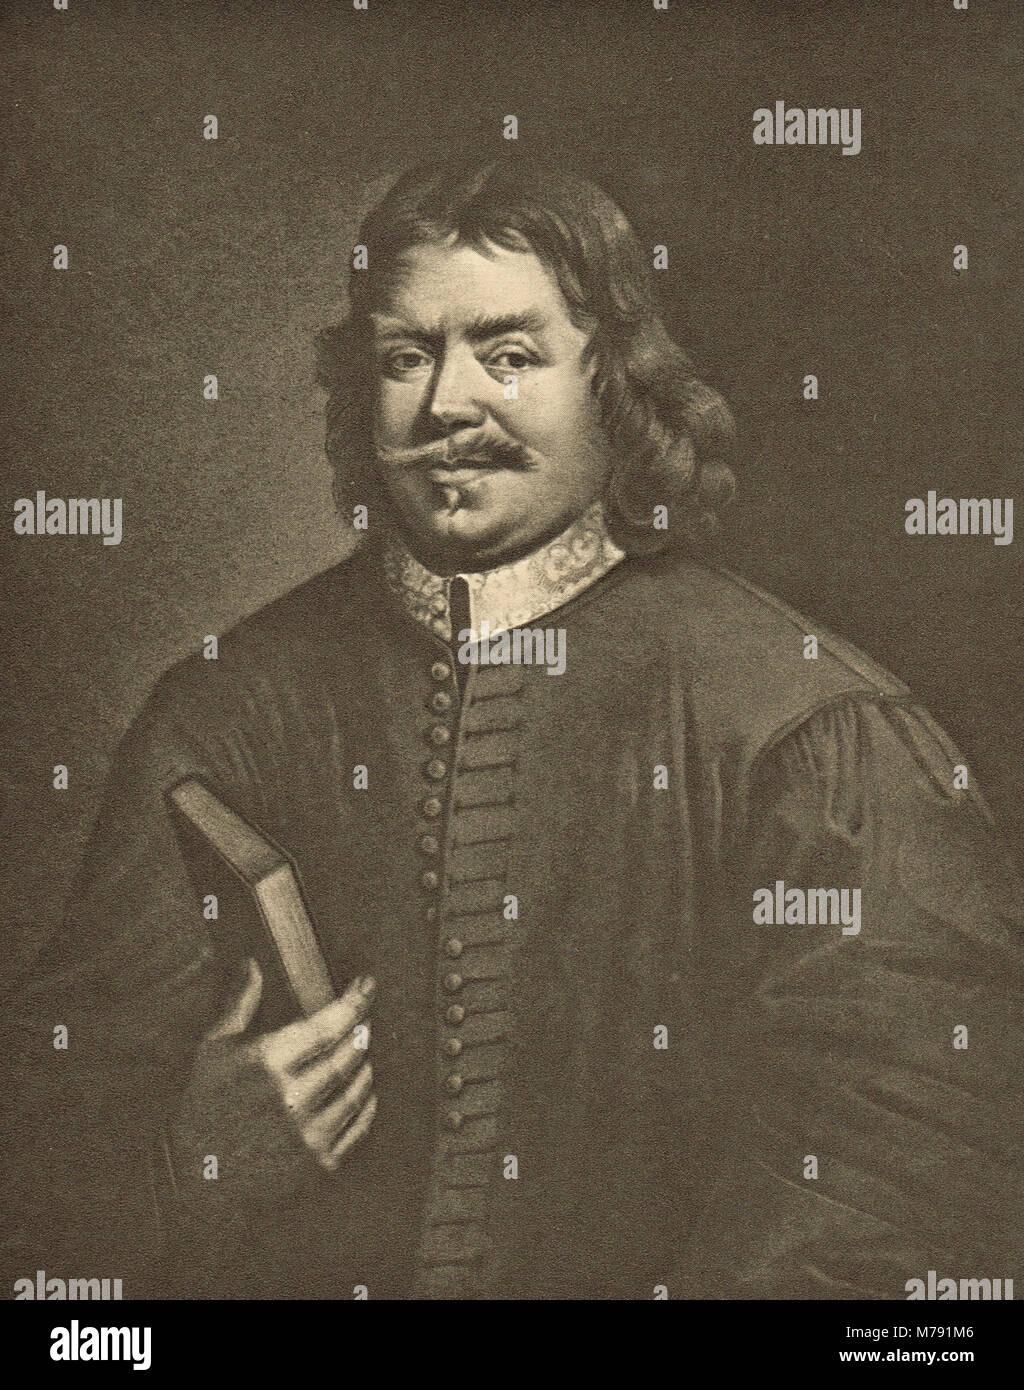 John Bunyan, englischer Schriftsteller, puritanische Prediger, Autor der Fortschritte des Pilgers Stockbild